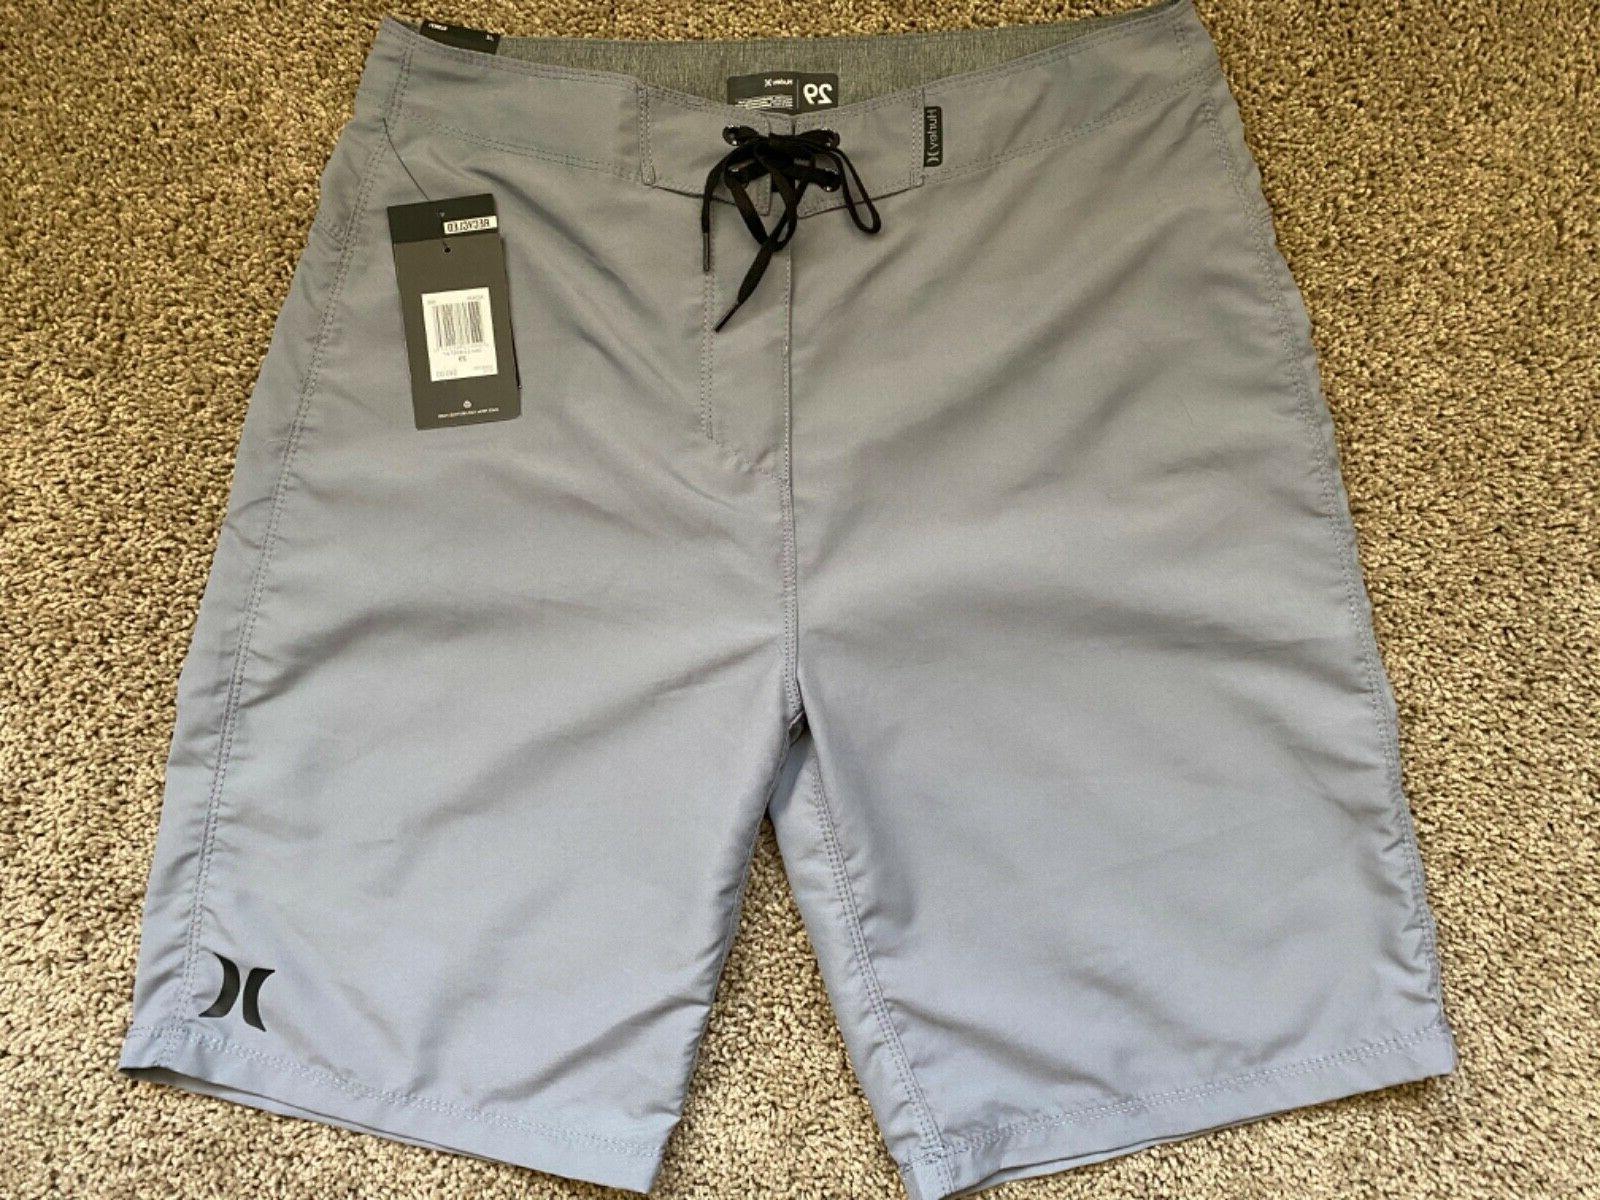 brand new mens board shorts gray one